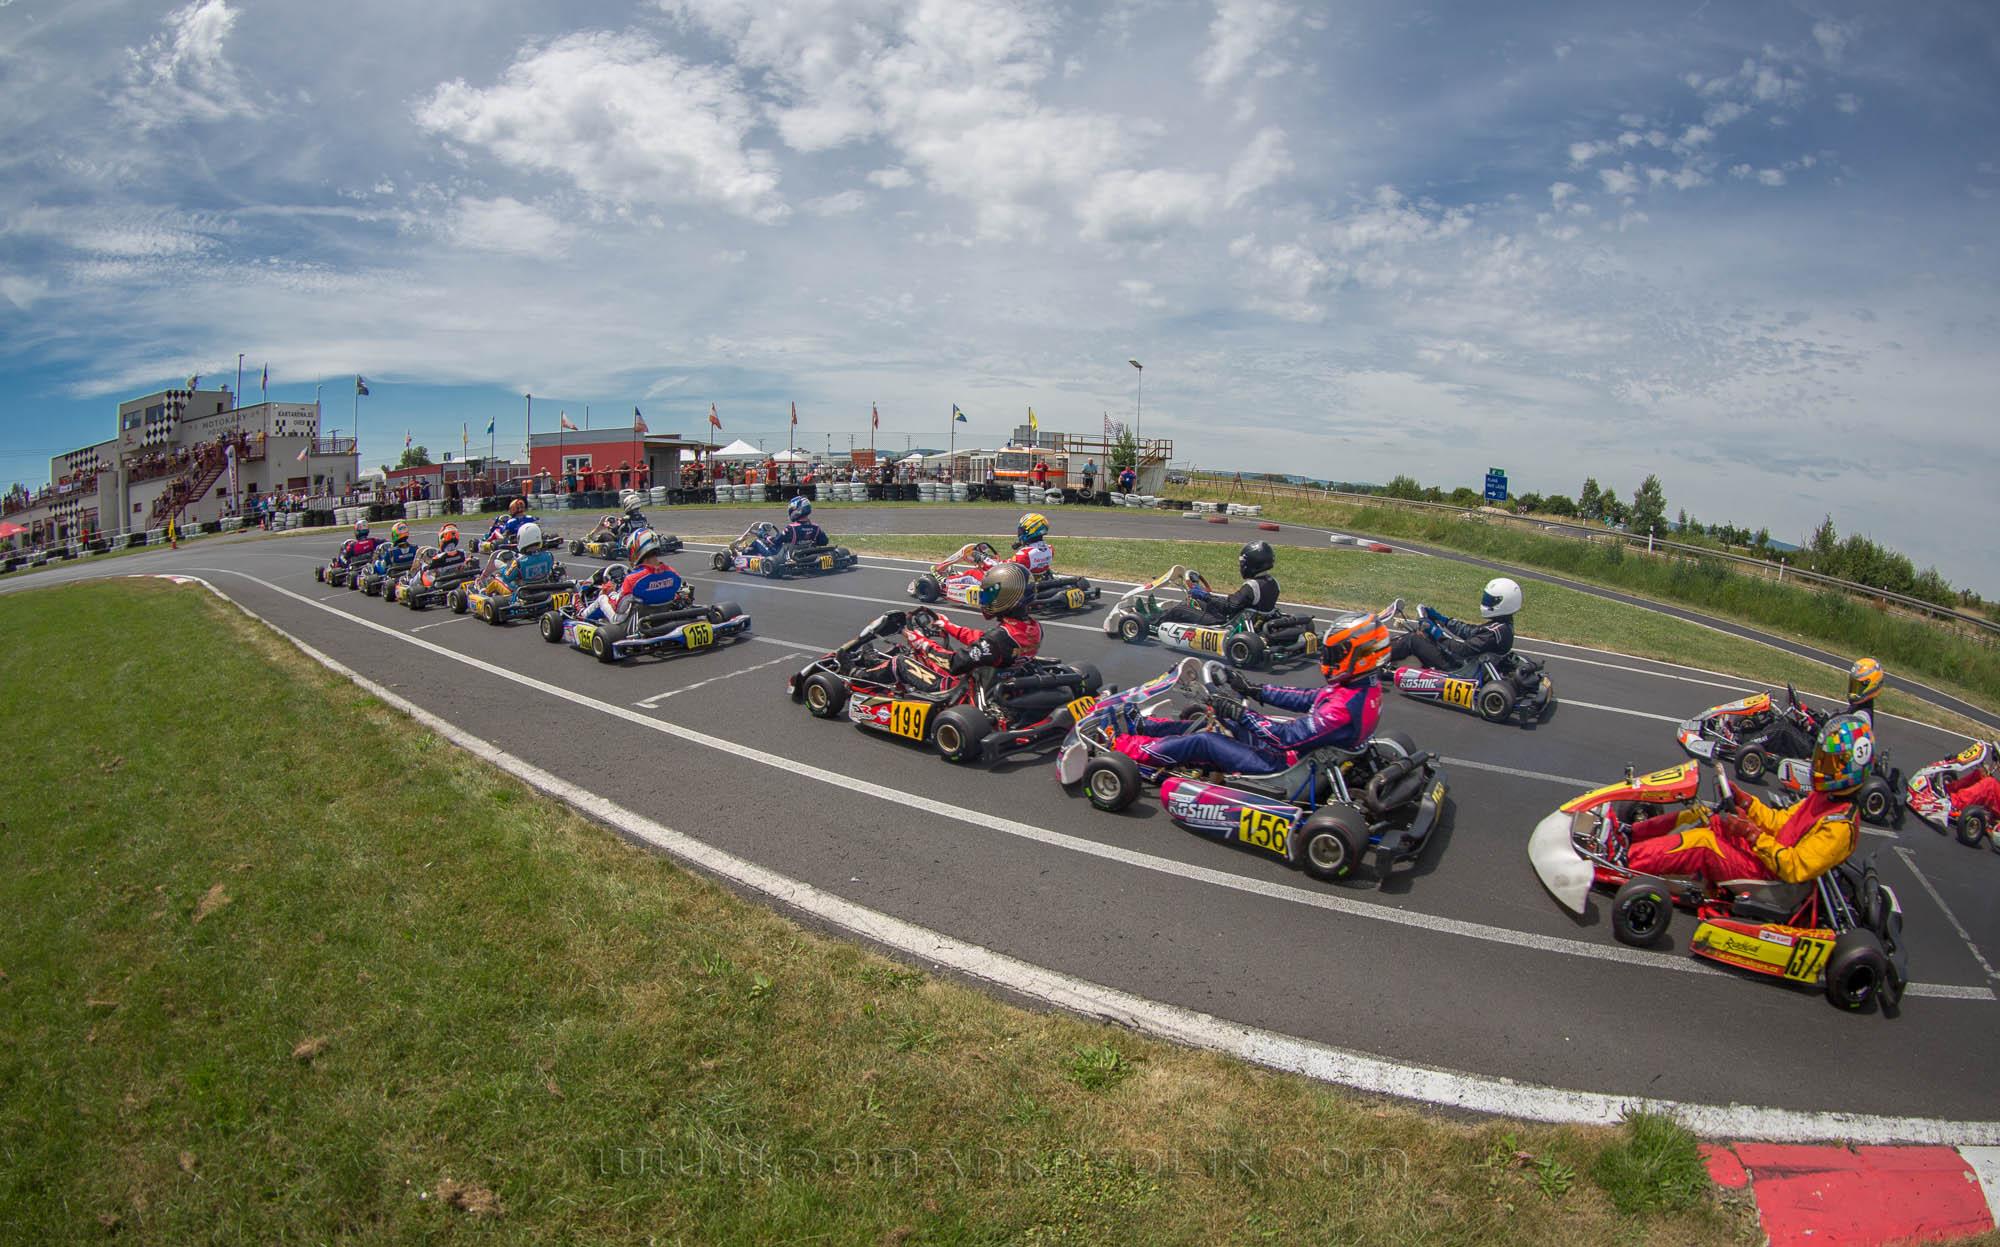 Race_Rotax_Europa-42